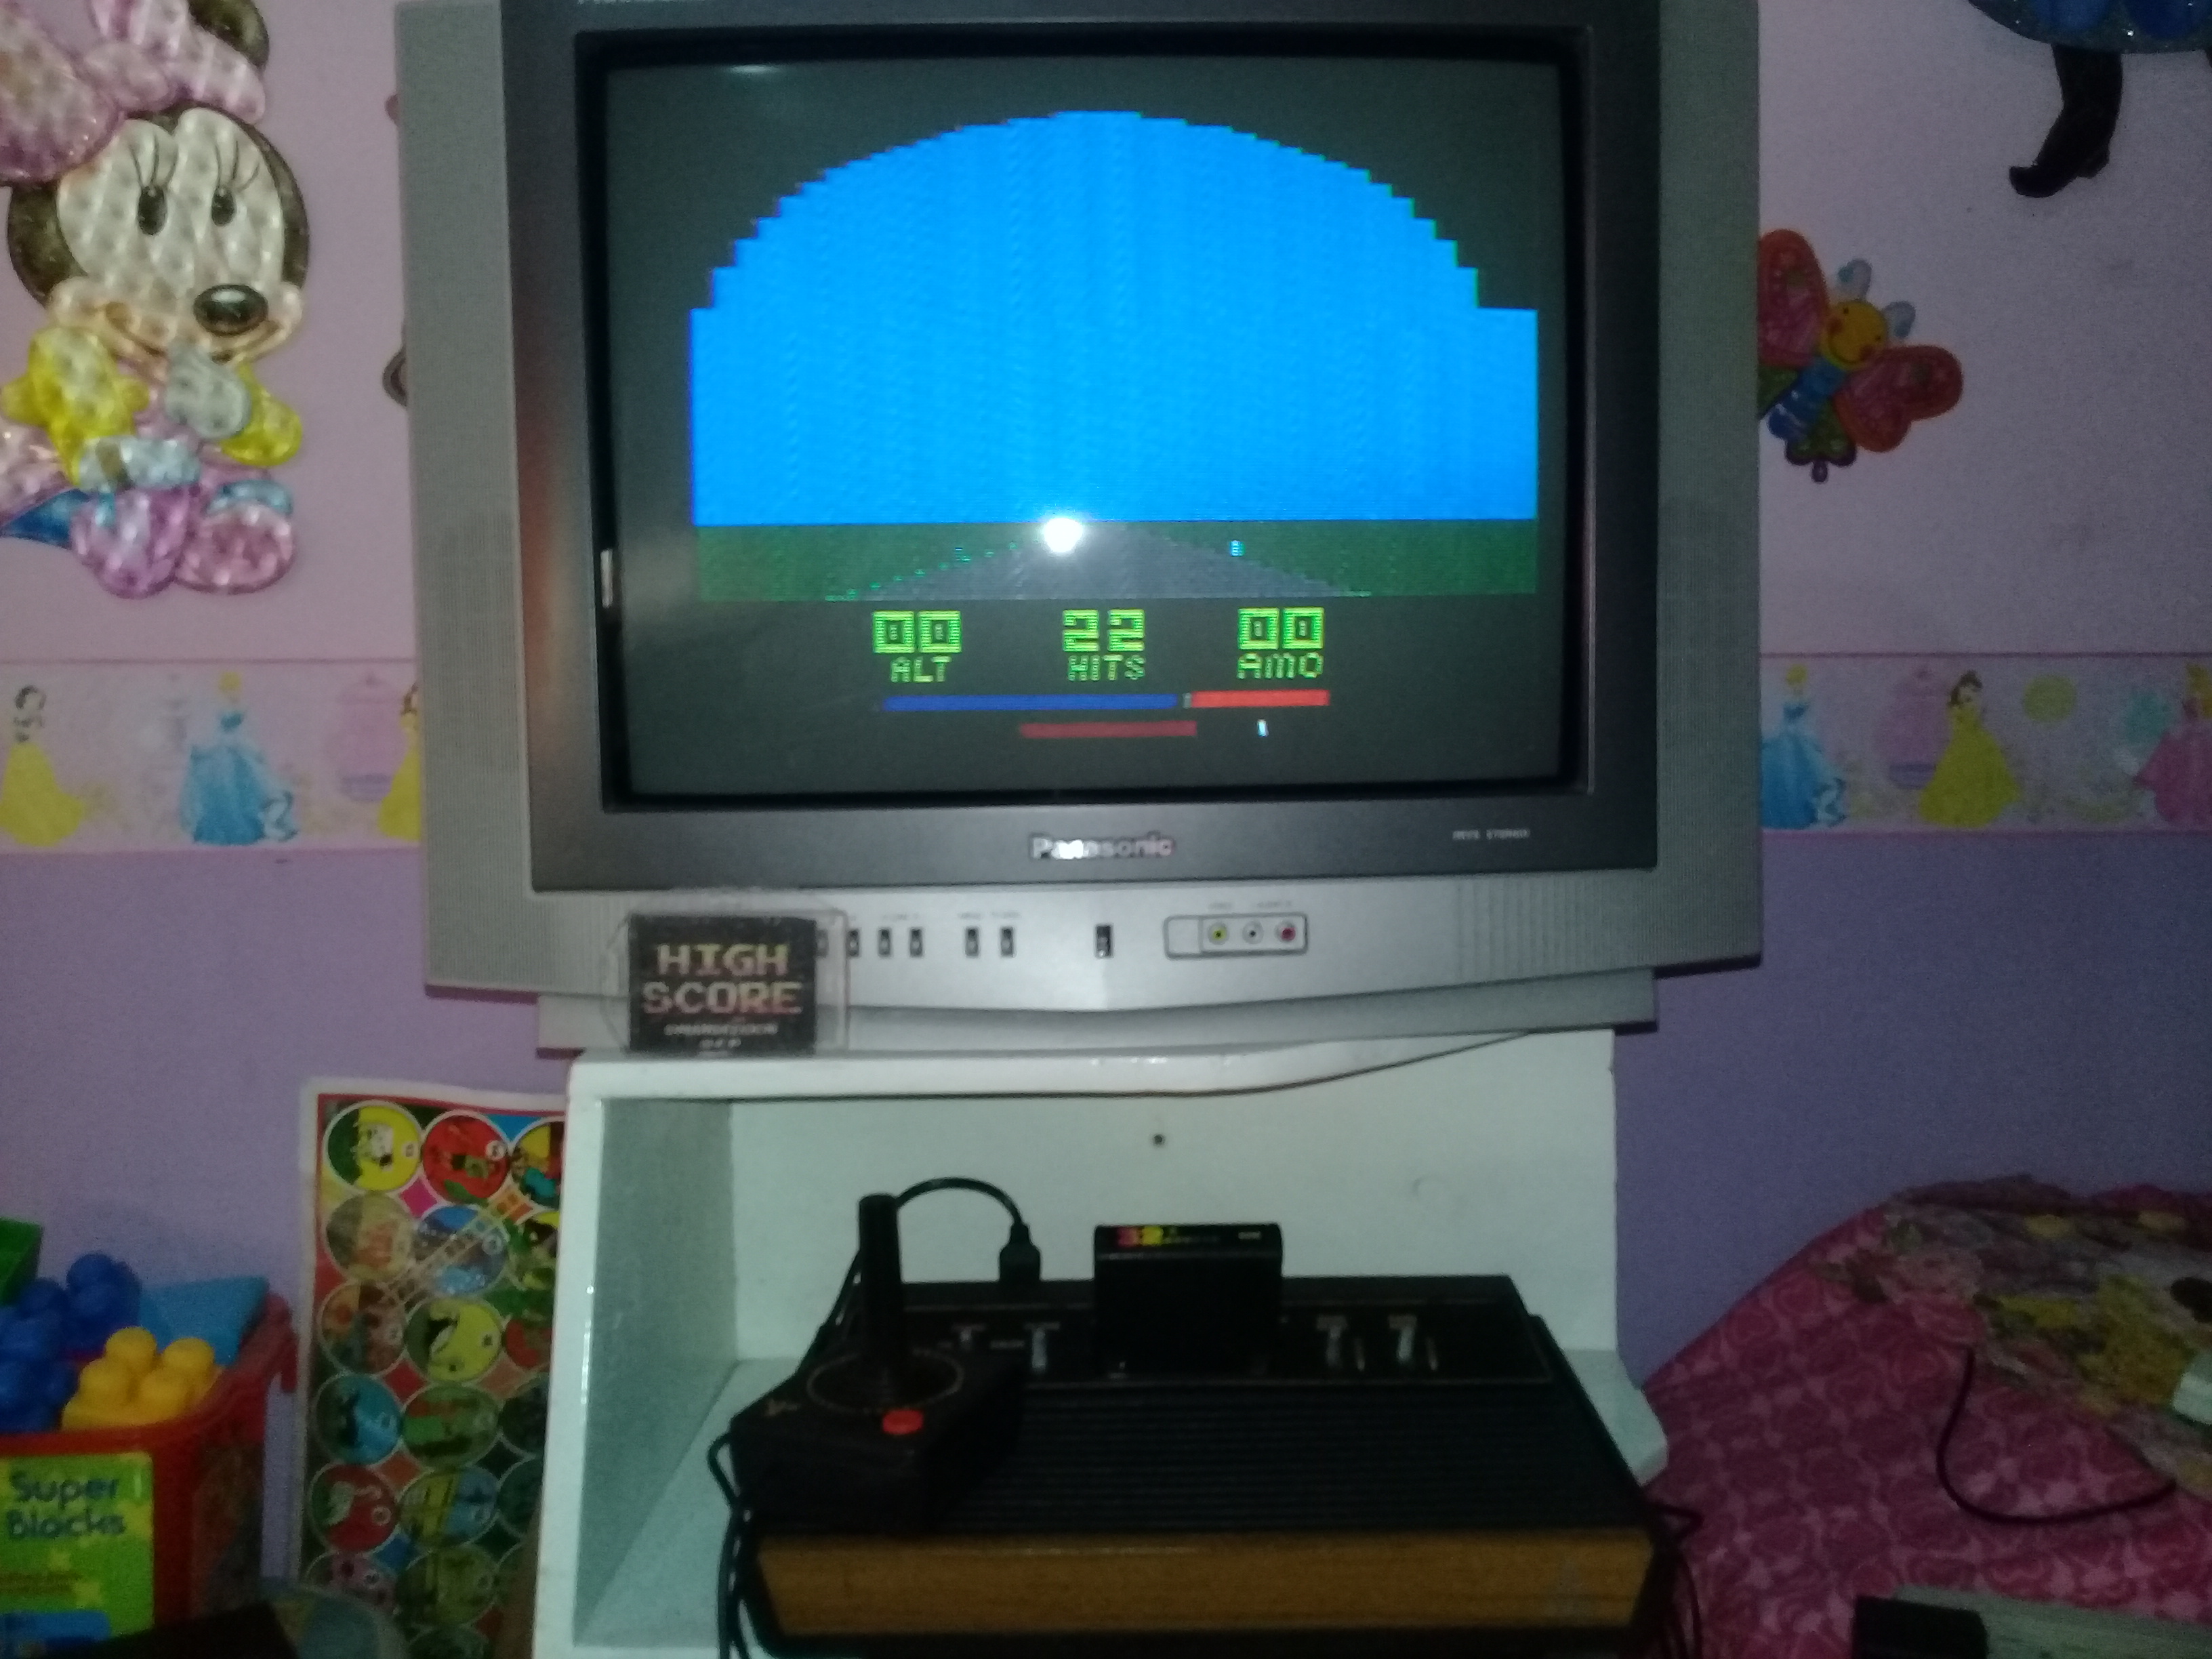 omargeddon: Air Raiders (Atari 2600 Expert/A) 22 points on 2019-06-09 18:01:22